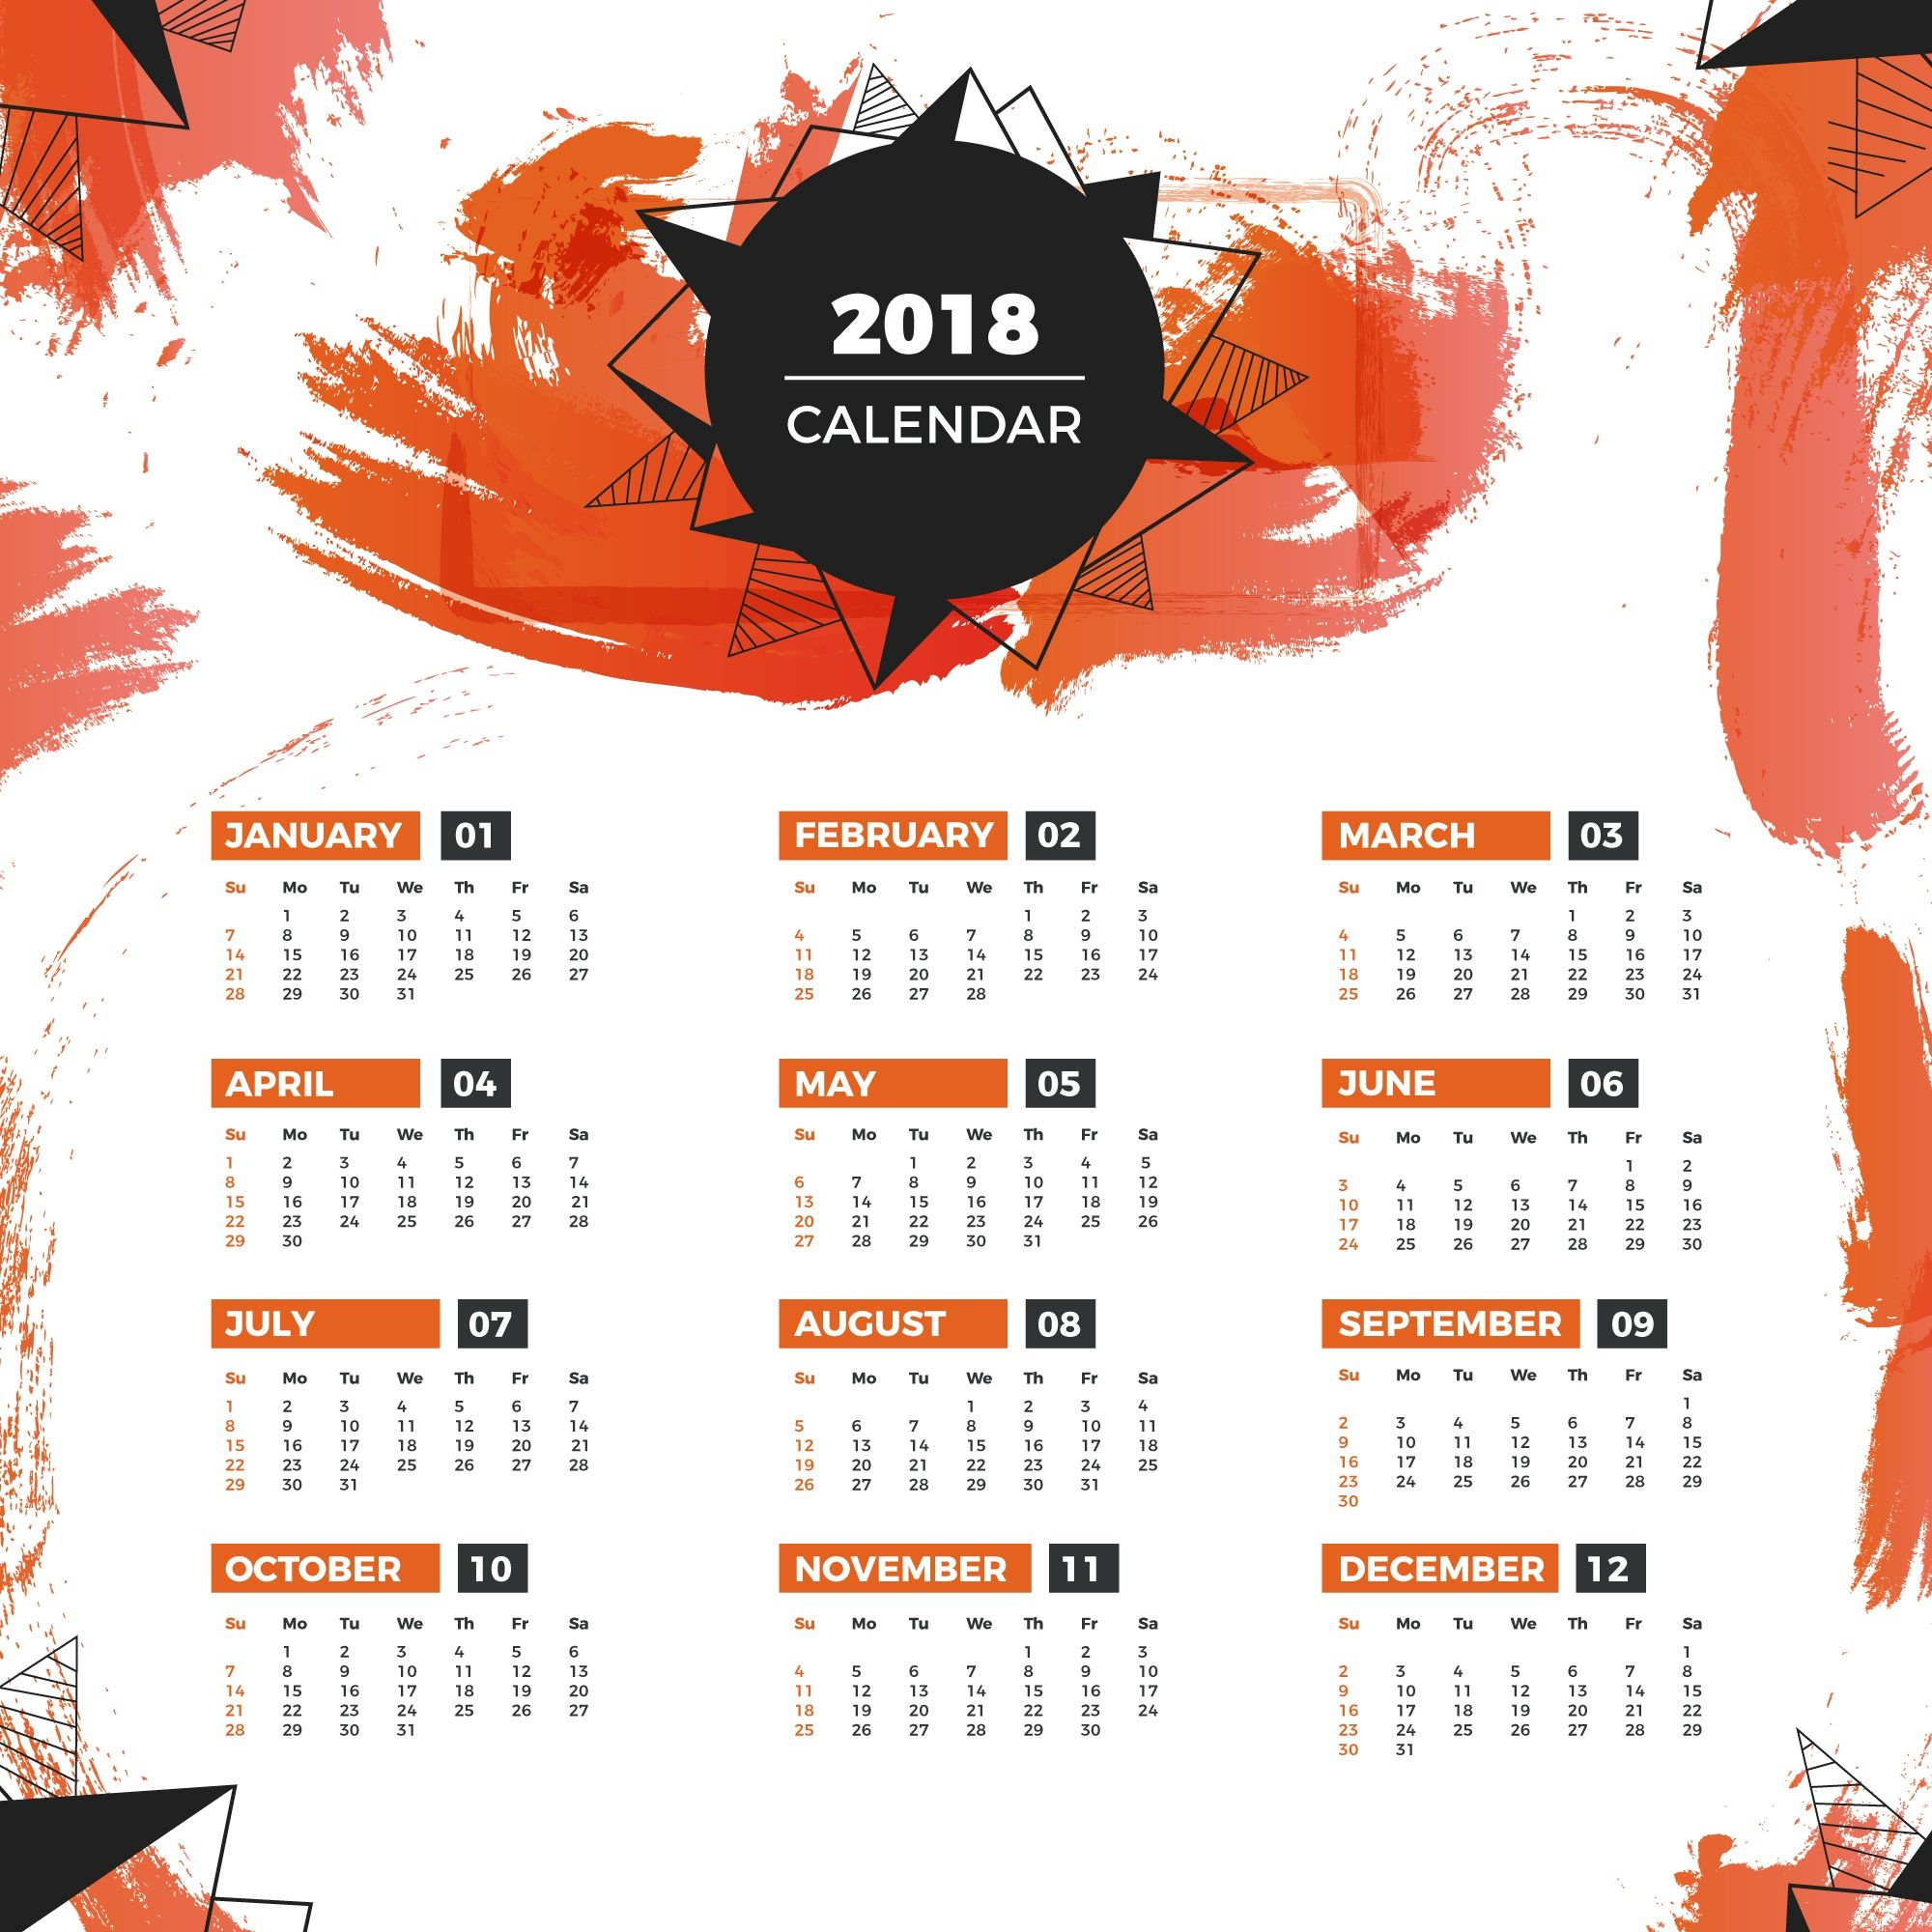 2018 Year Calendar Wallpaper Download Free 2018 Calendar By